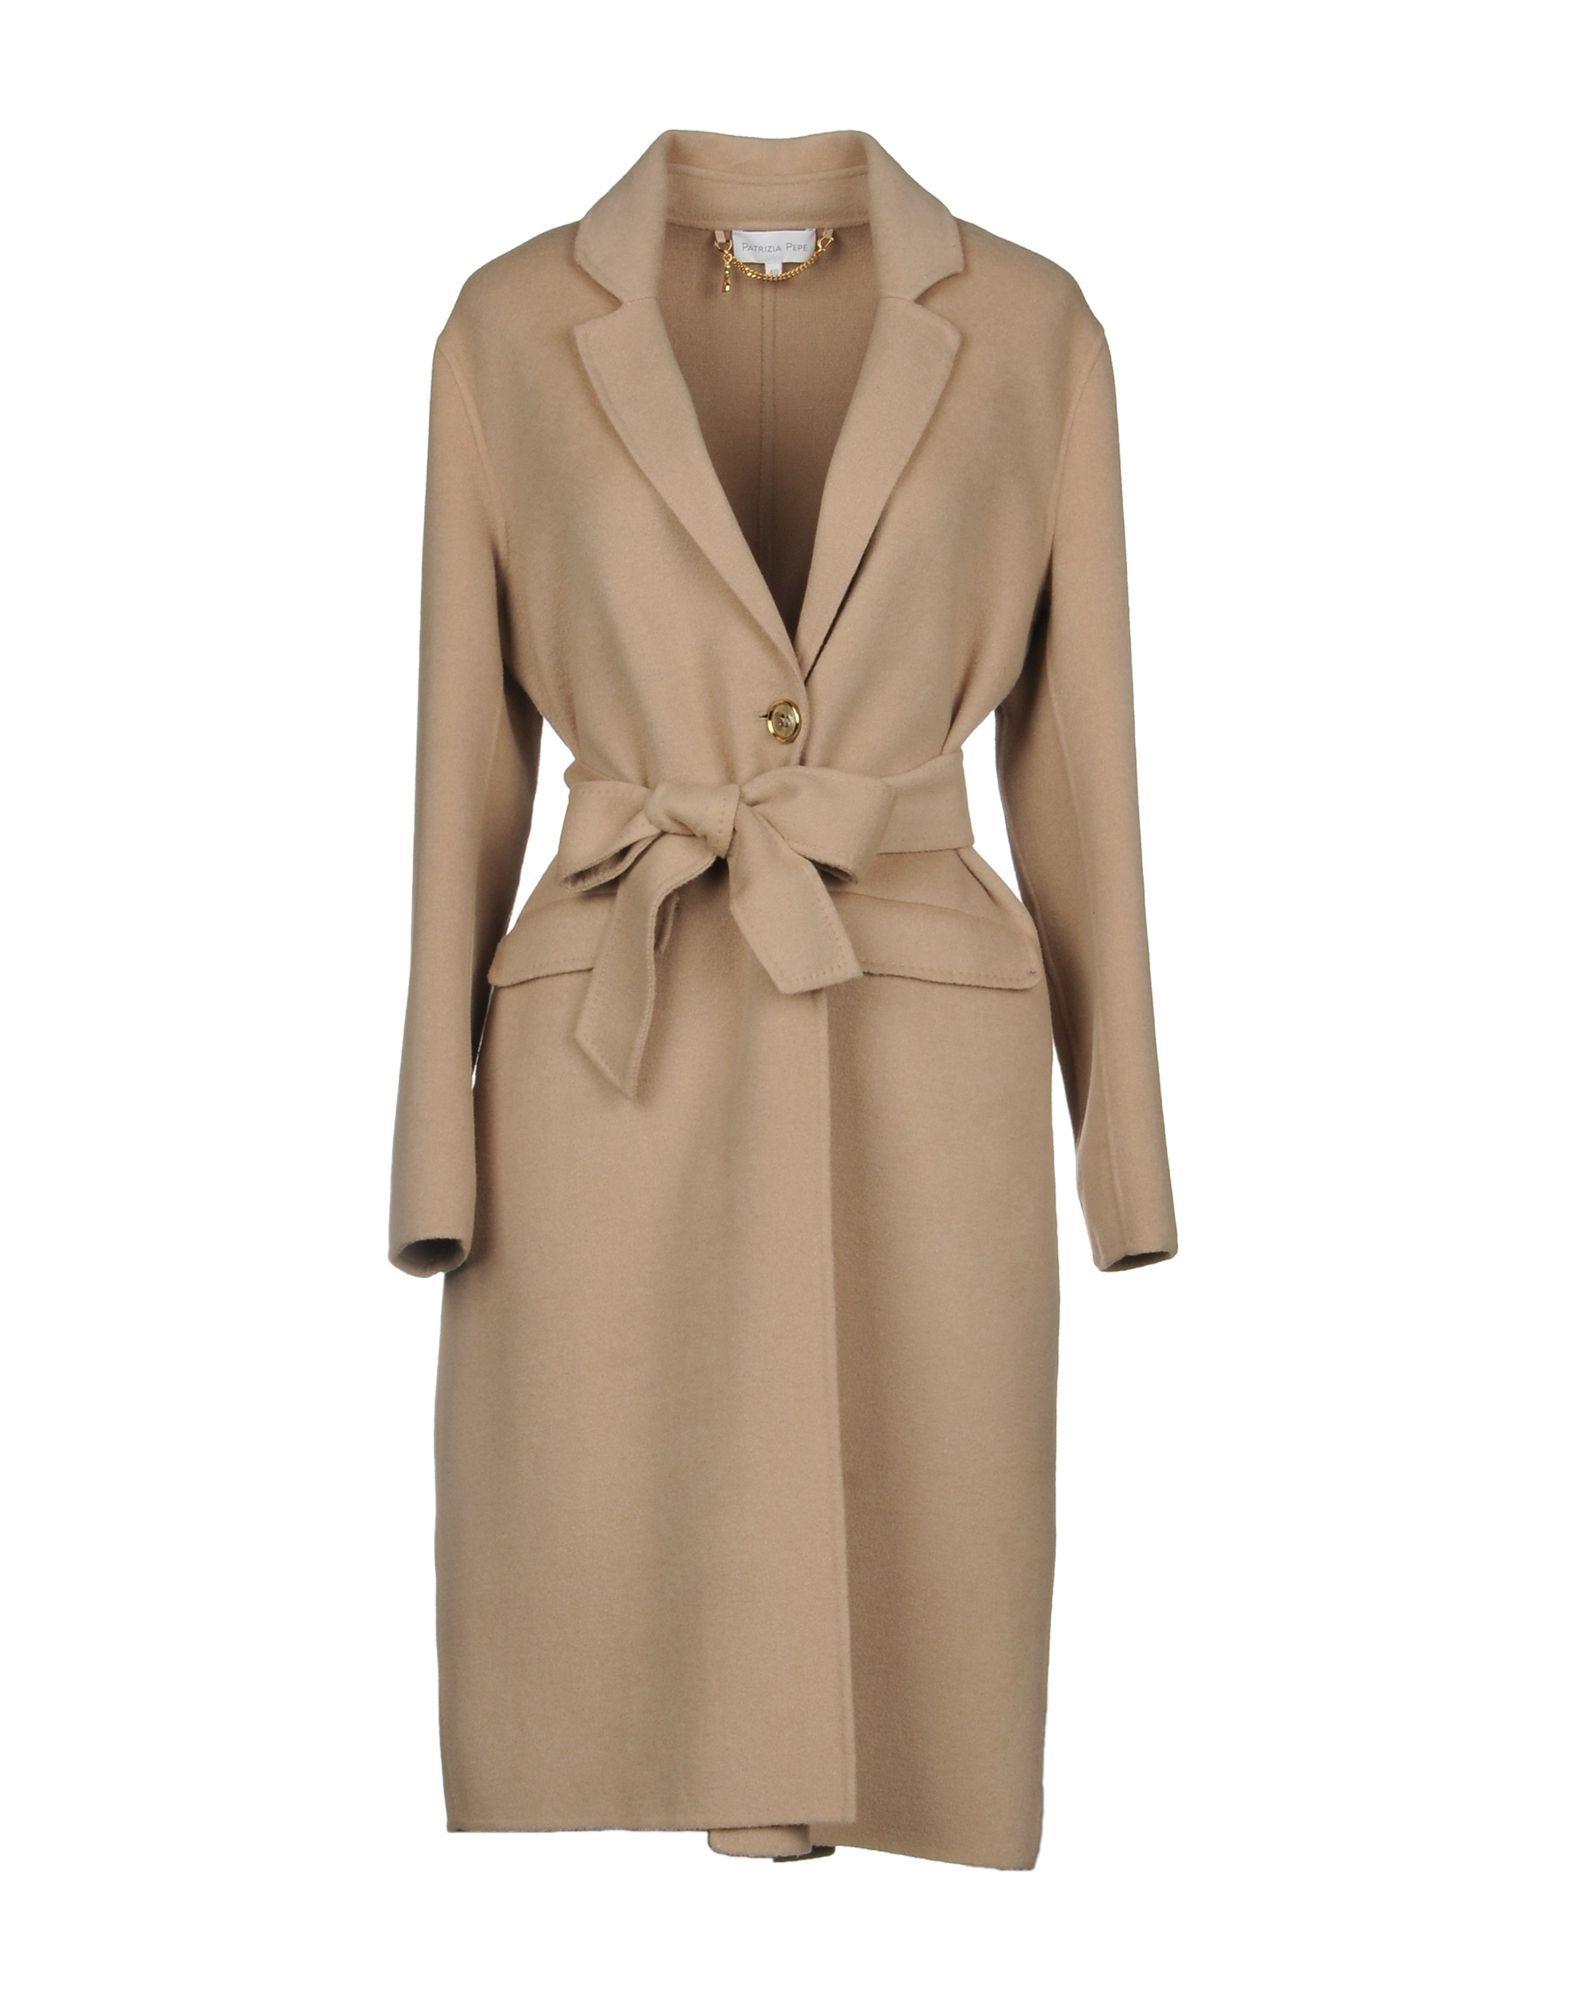 Patrizia Pepe Beige Wool Belted Coat